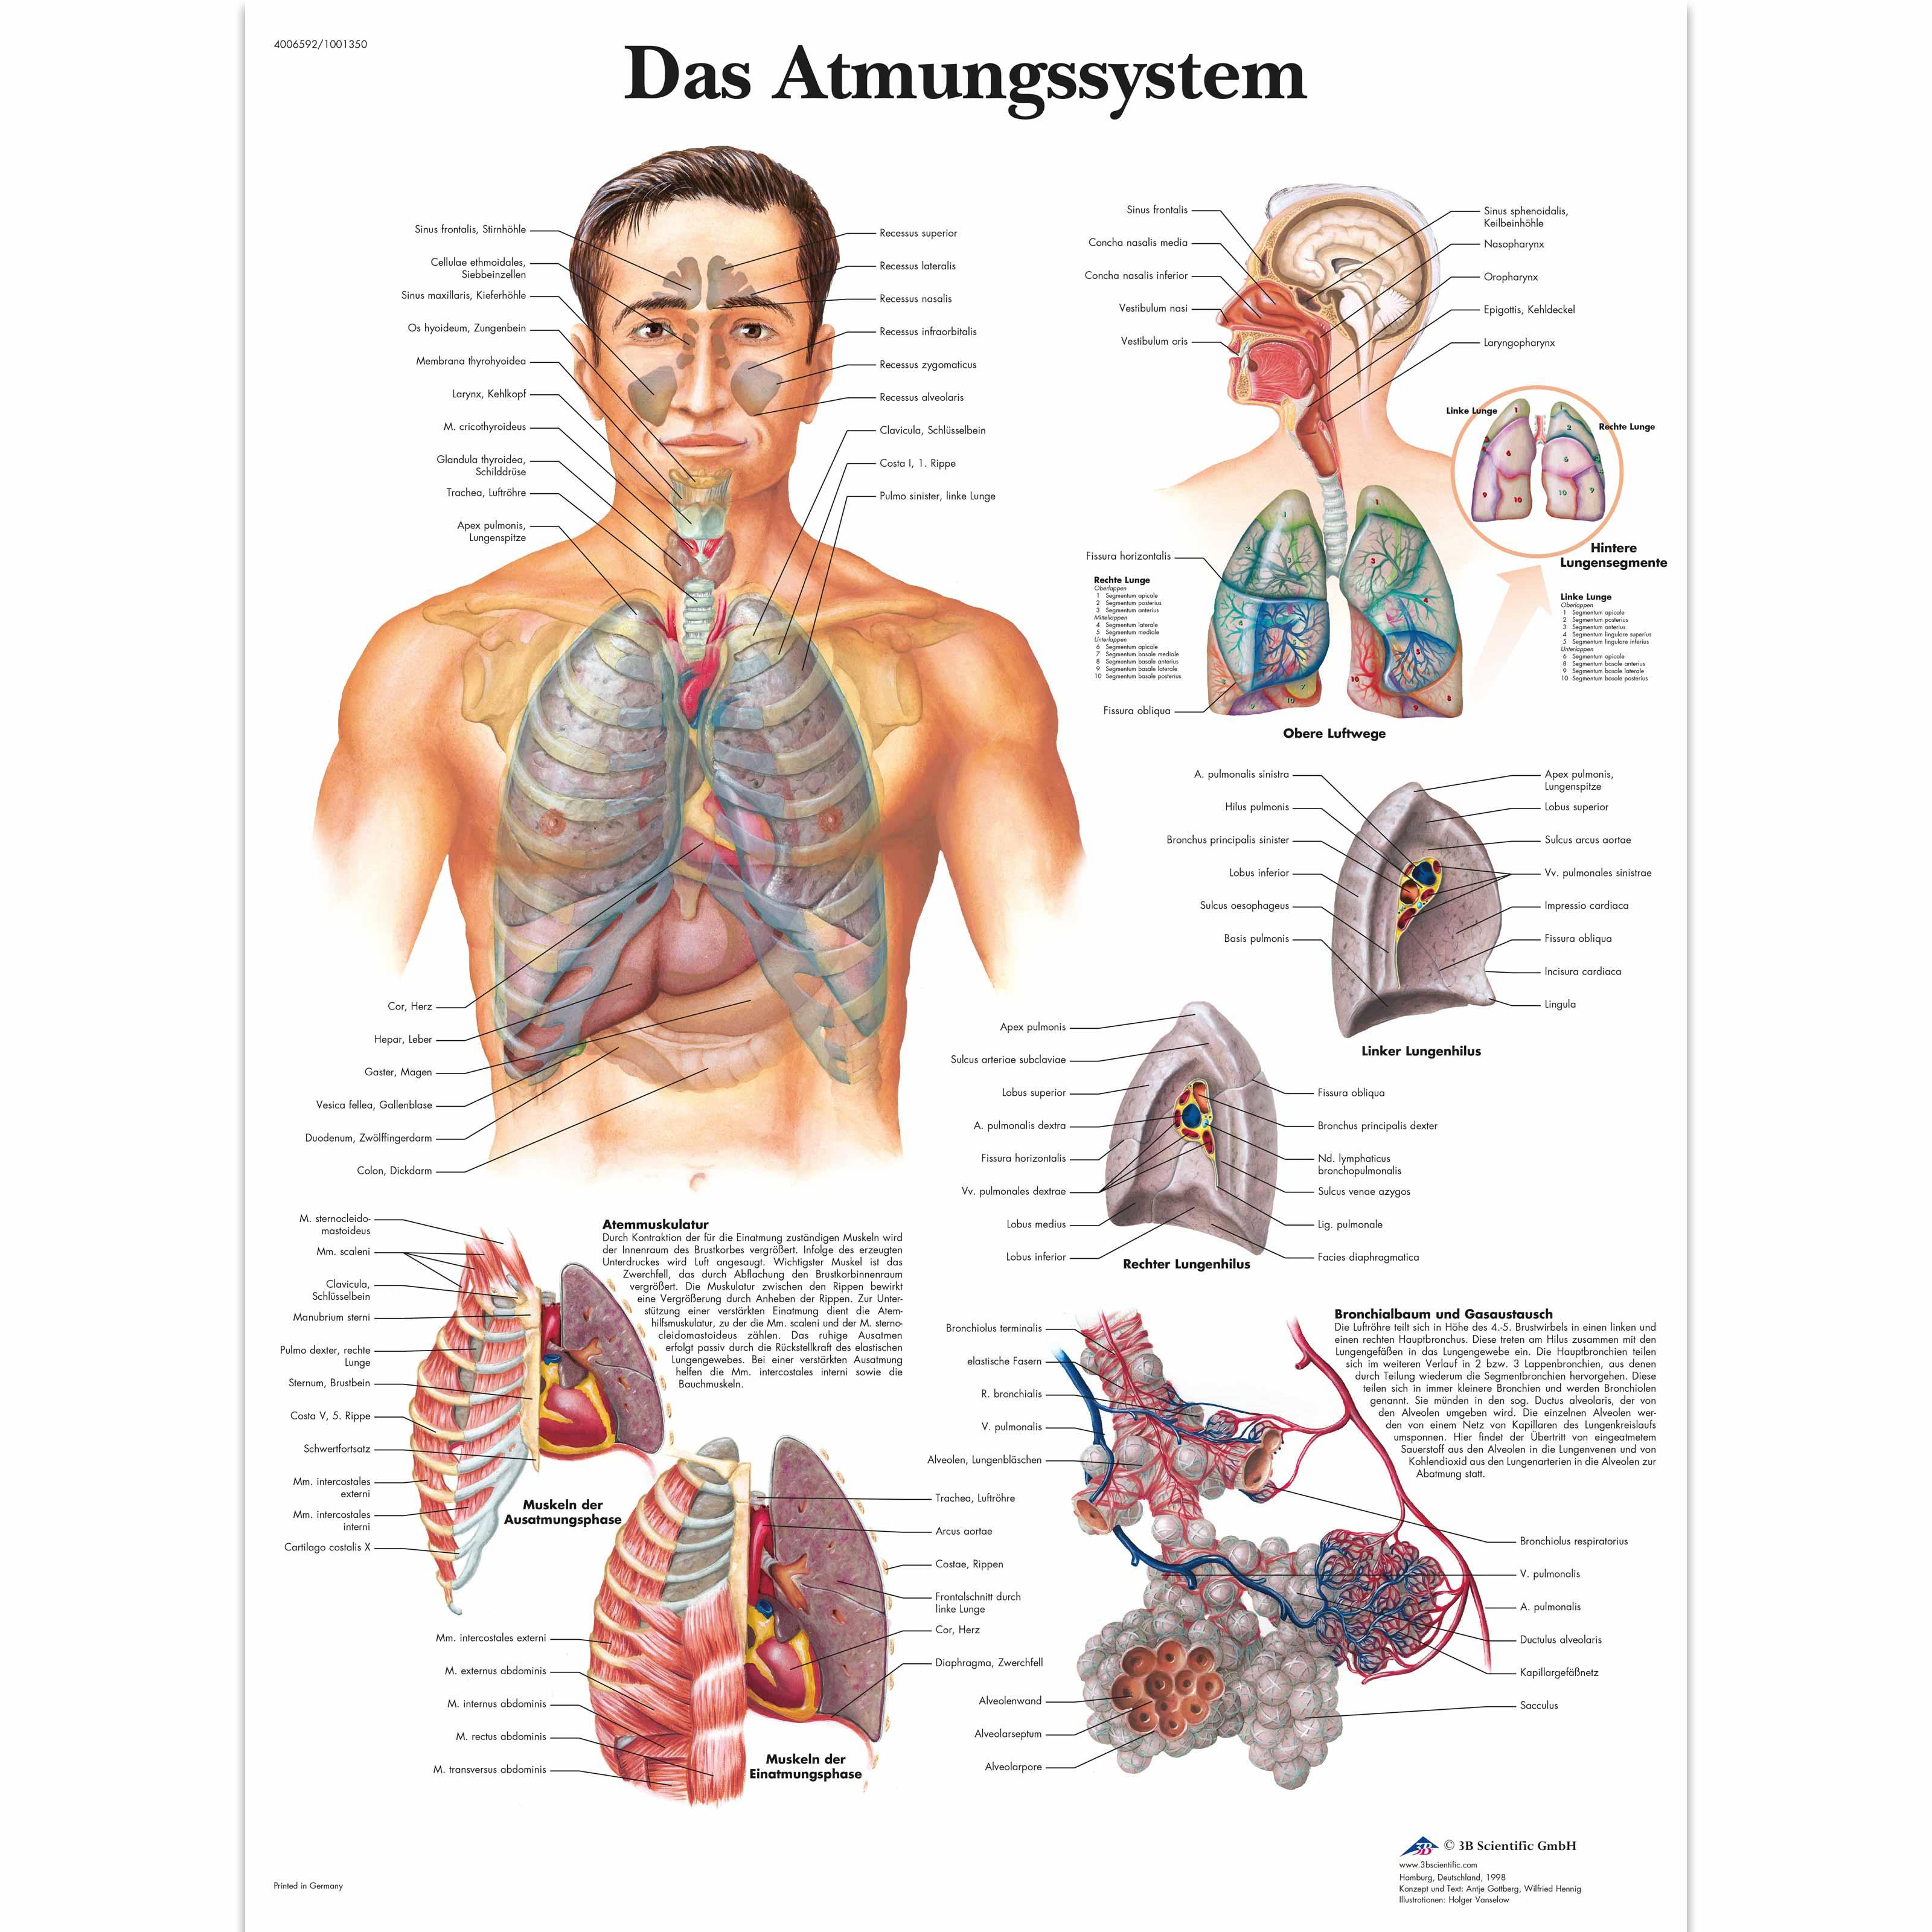 Das Atmungssystem - 1001350 - VR0322L - Respiratory System - 3B ...